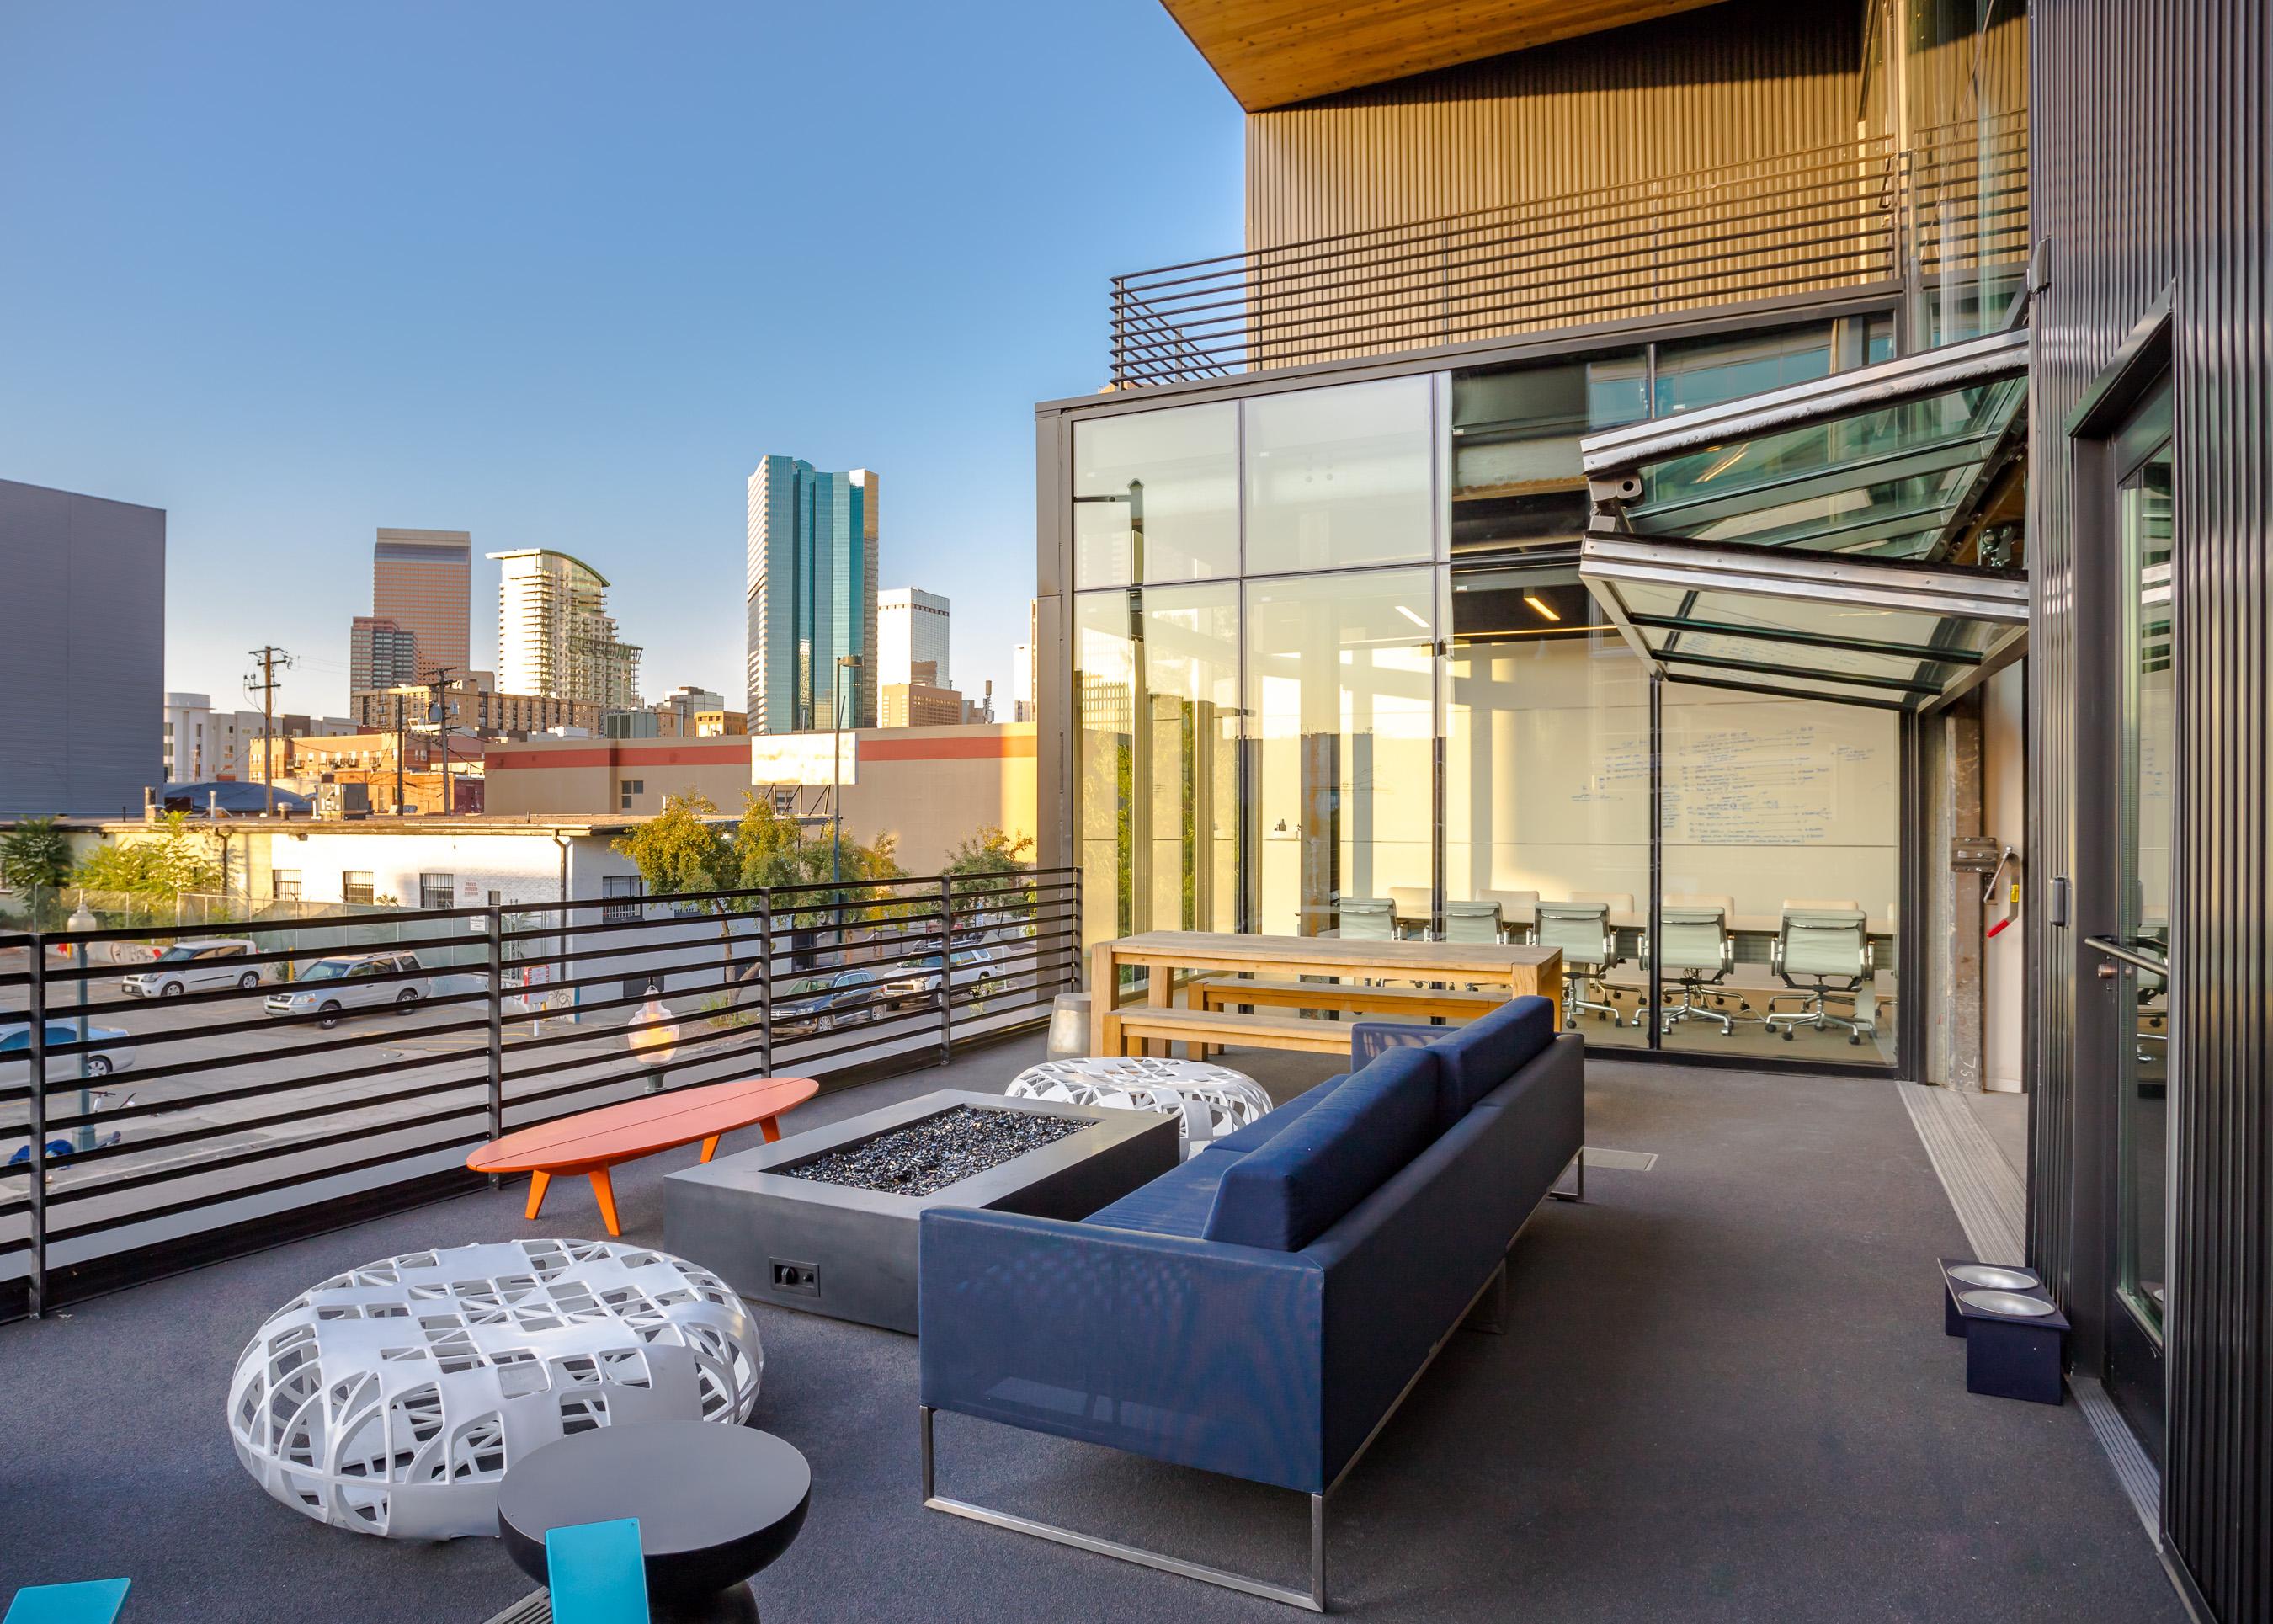 10 OSA exterior courtyard downtown view.